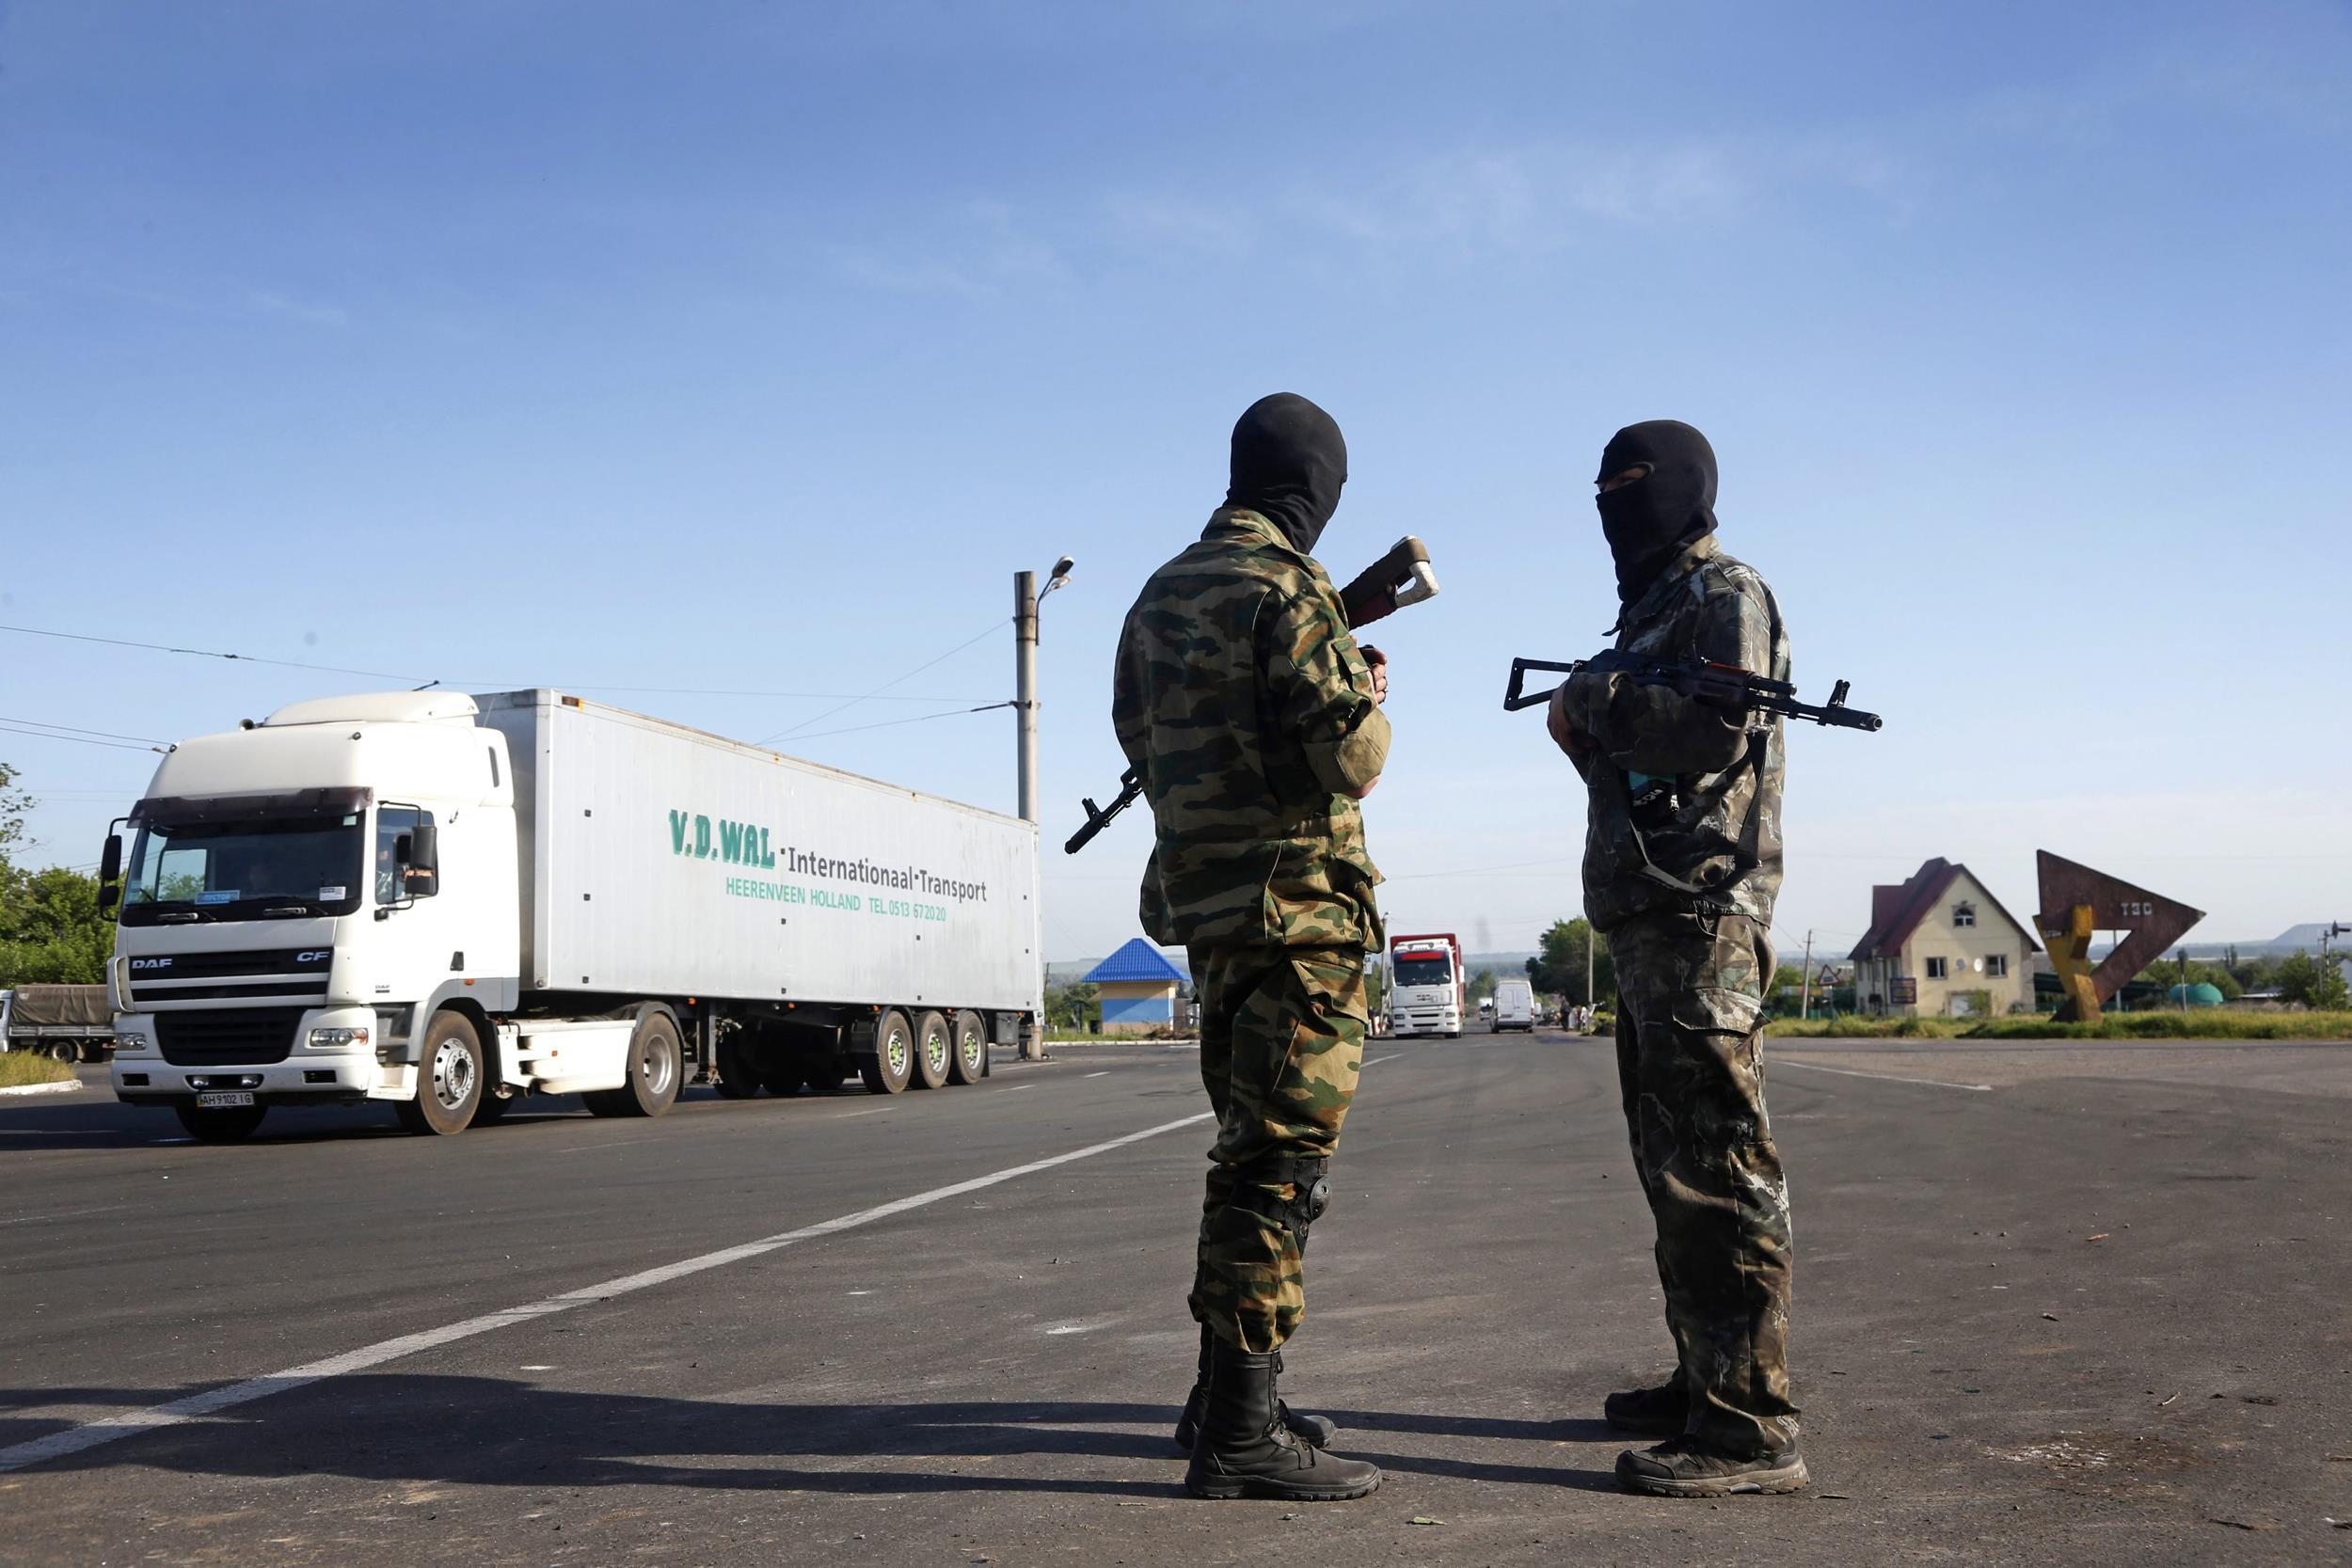 Image: Clashes in eastern Ukraine